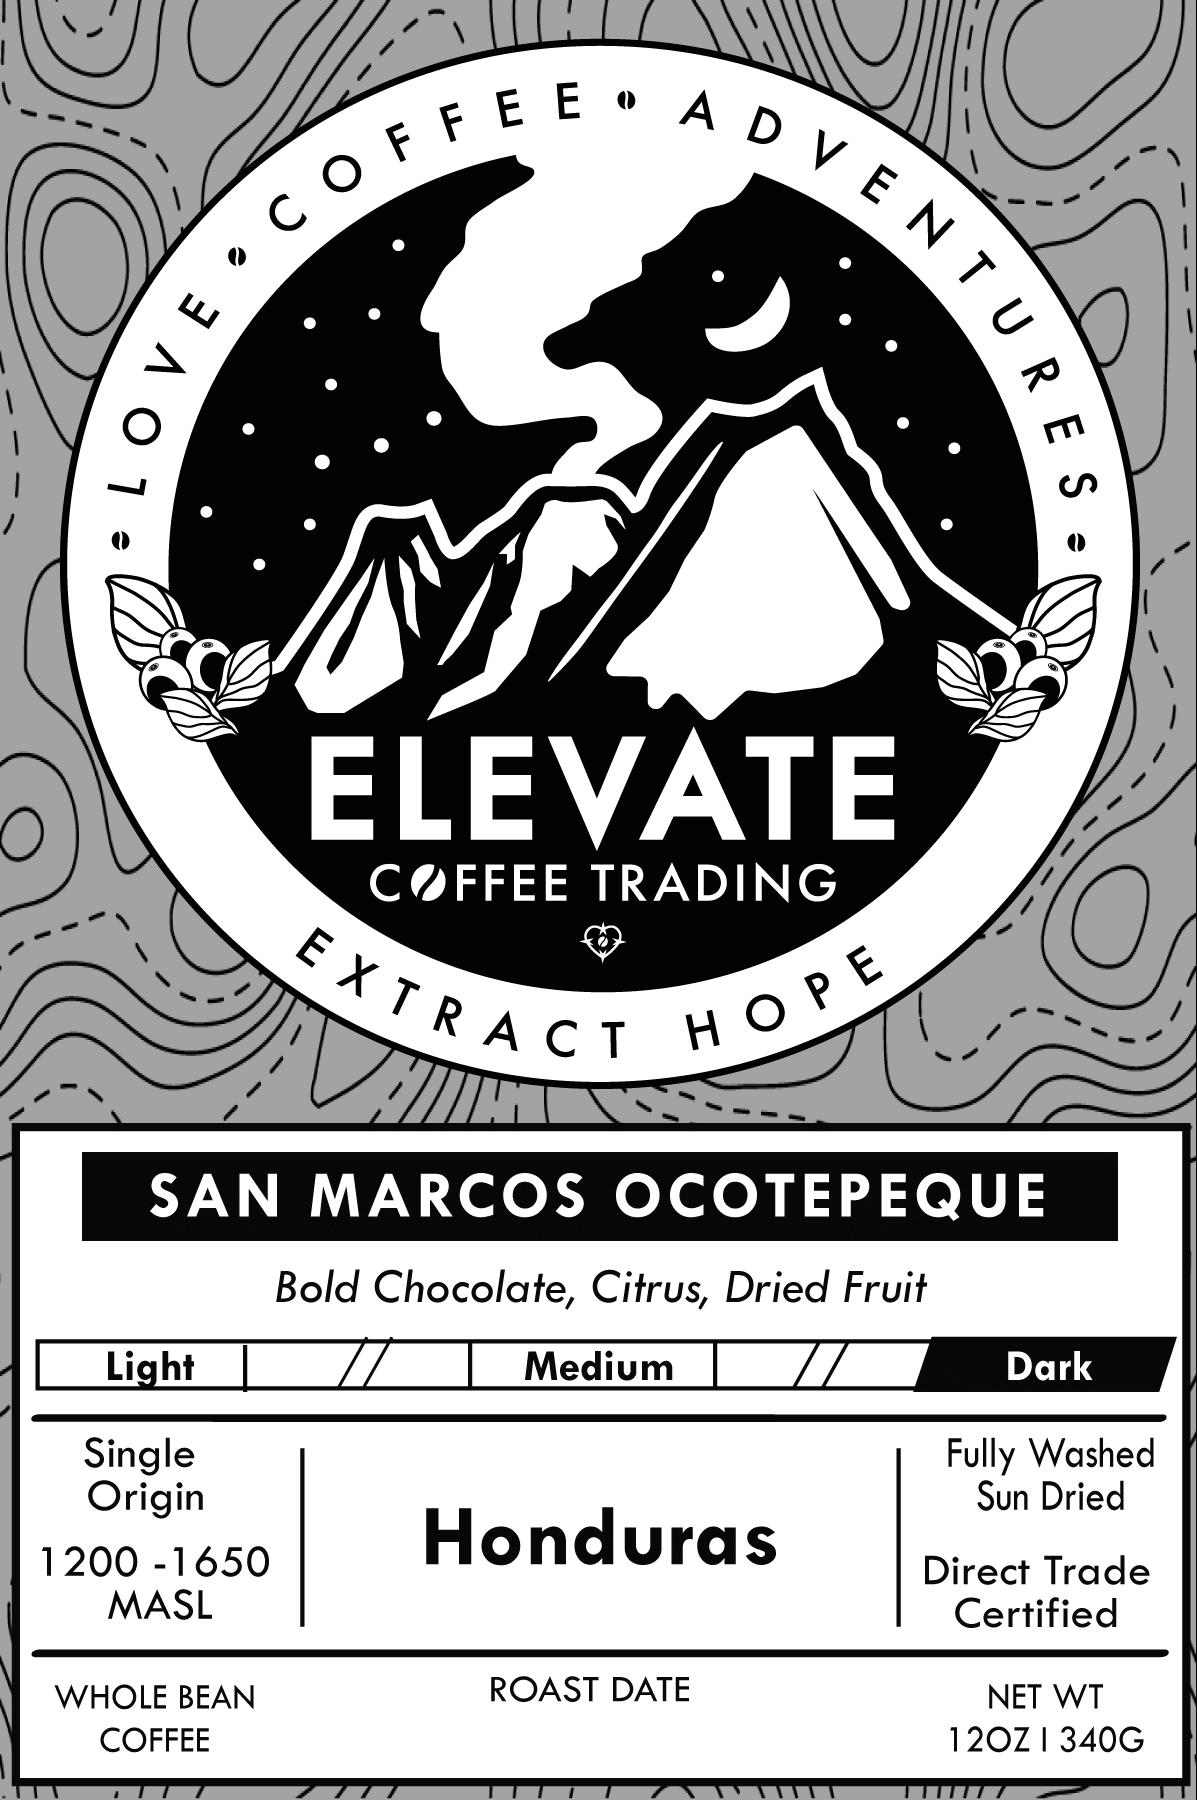 Honduras - Dark Roast from Elevate Coffee Trading